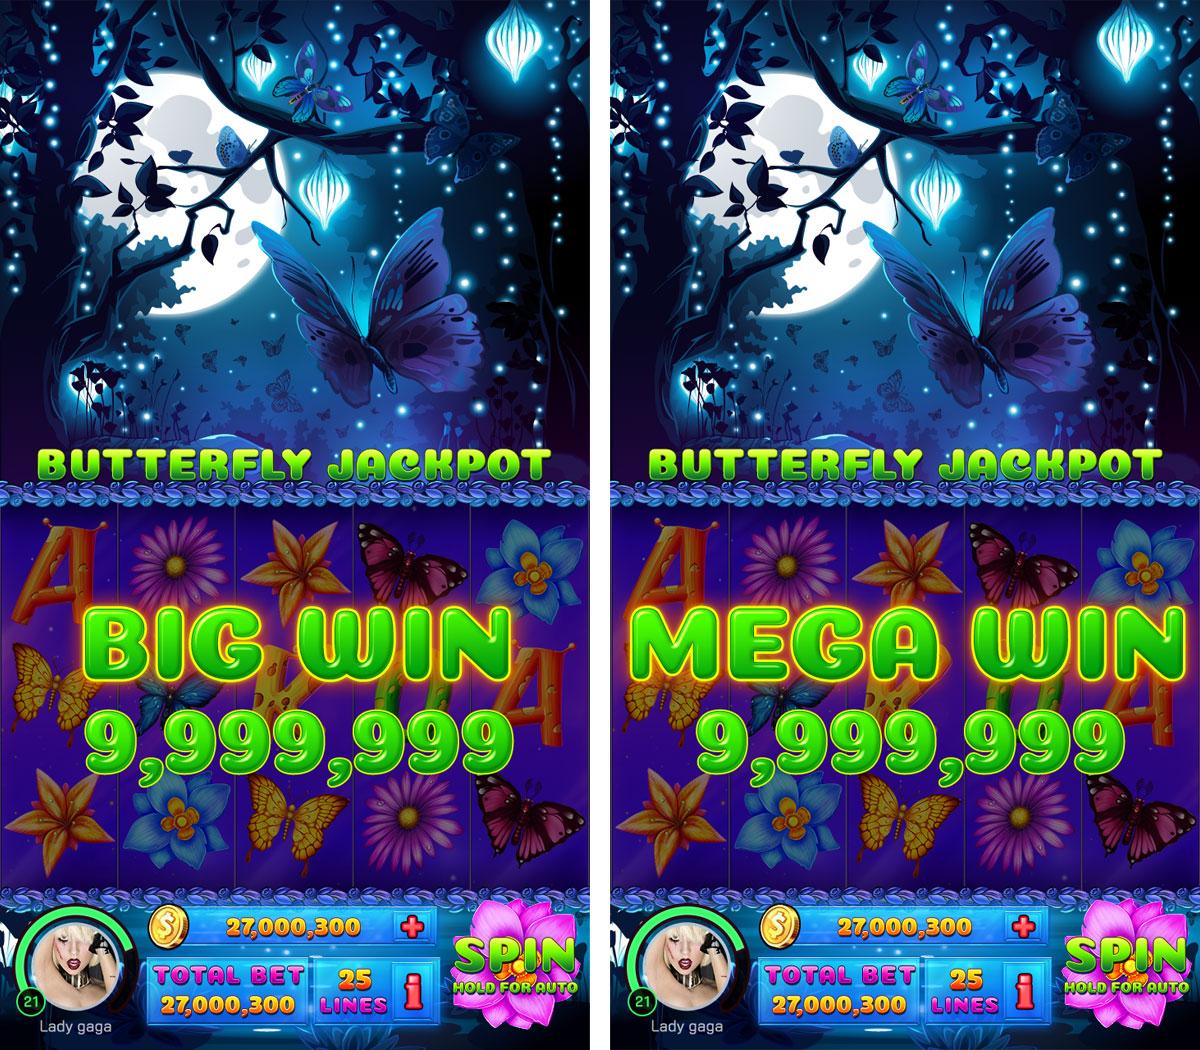 butterfly_jackpot_blog_win-2